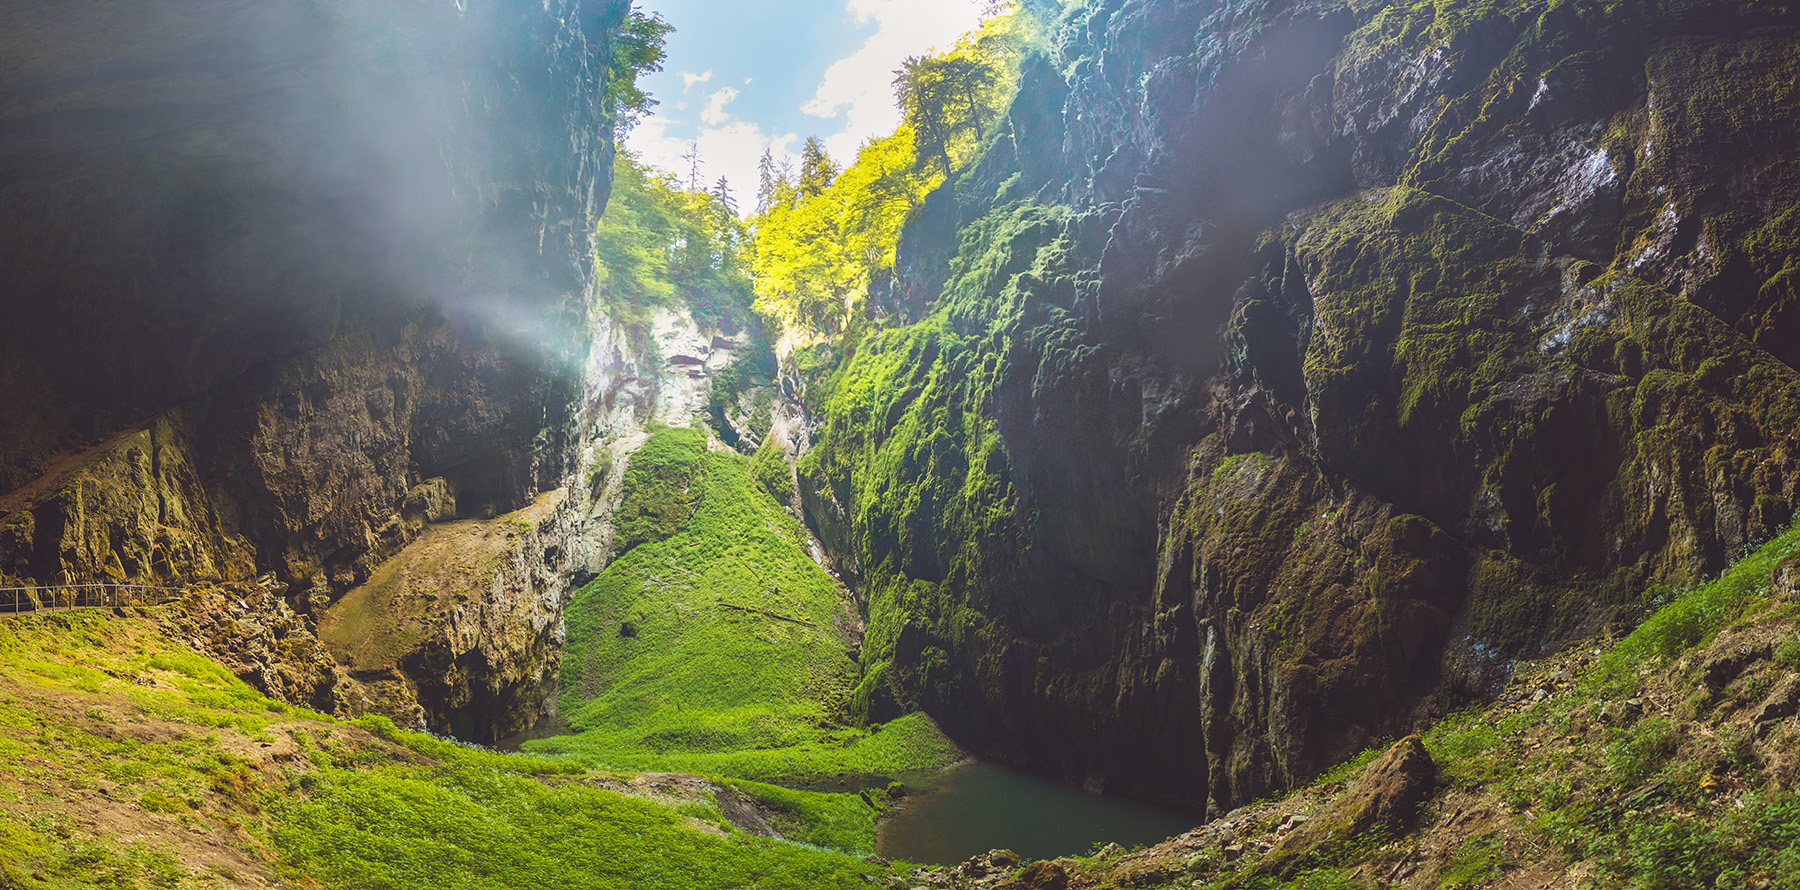 Punkva Caves, Czechia